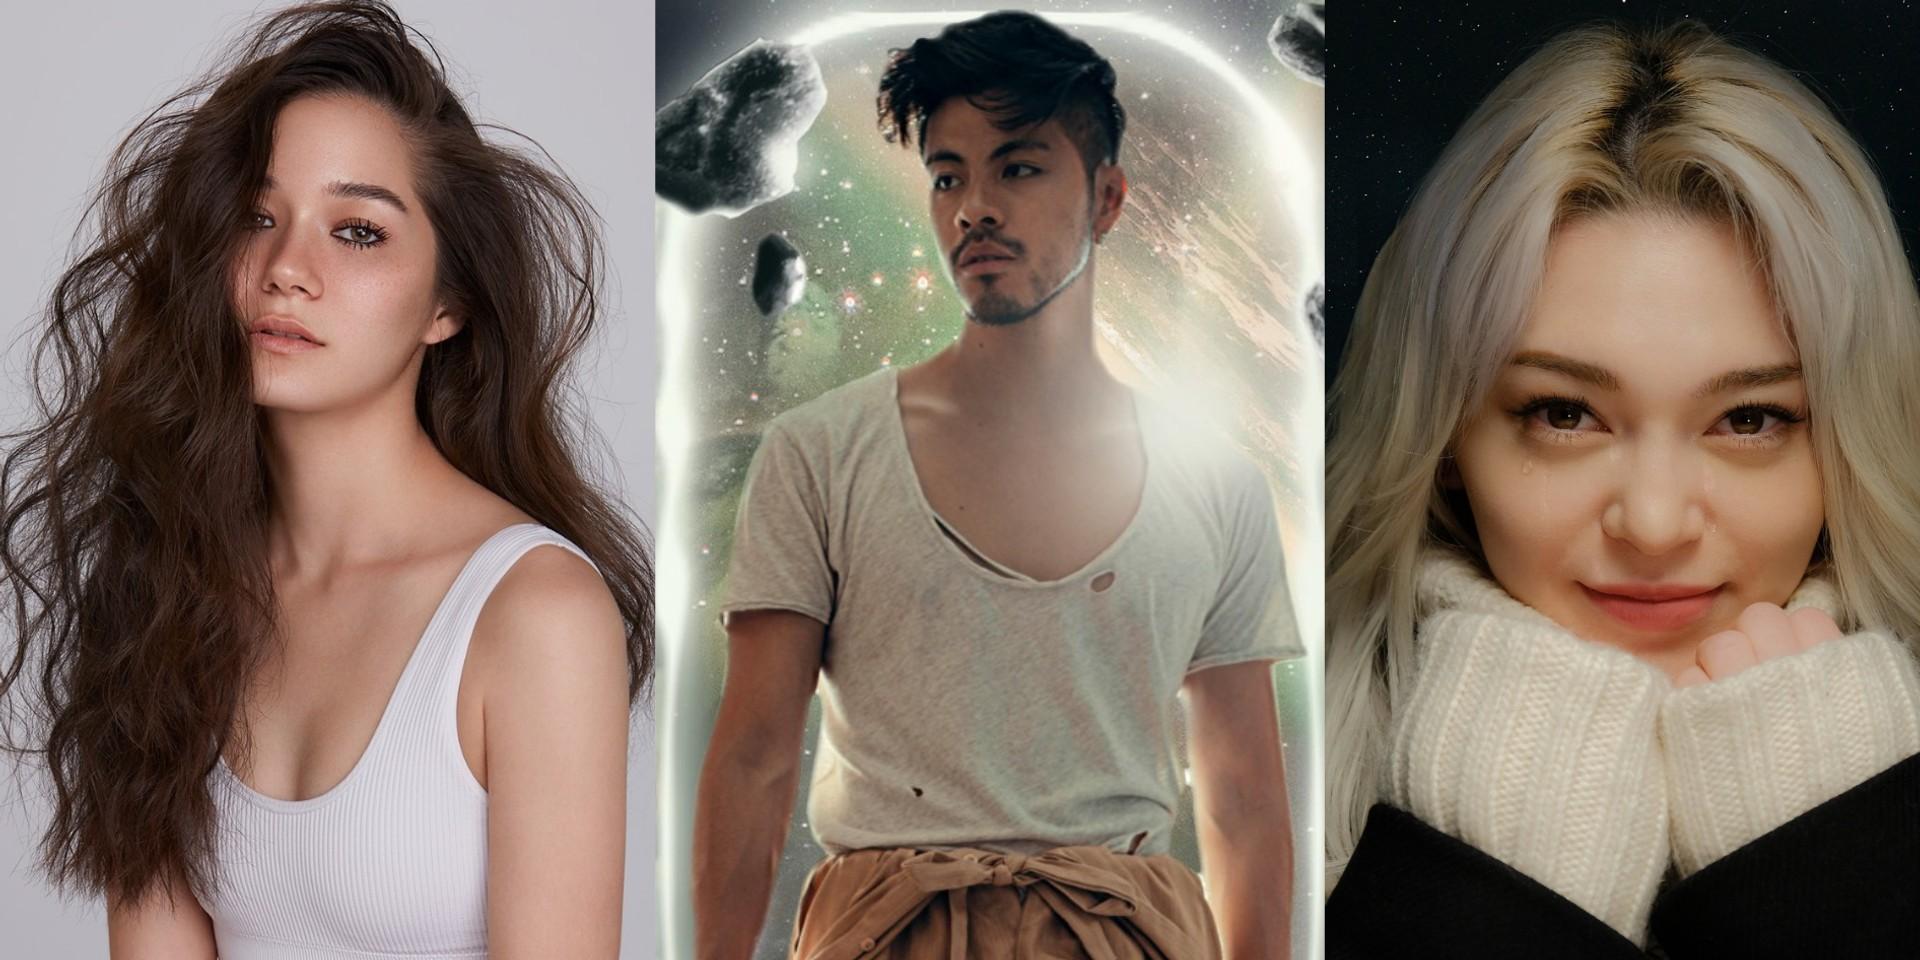 Benjamin Kheng, Violette Wautier, AleXa, and more to headline TikTok Music Night Asia 2021